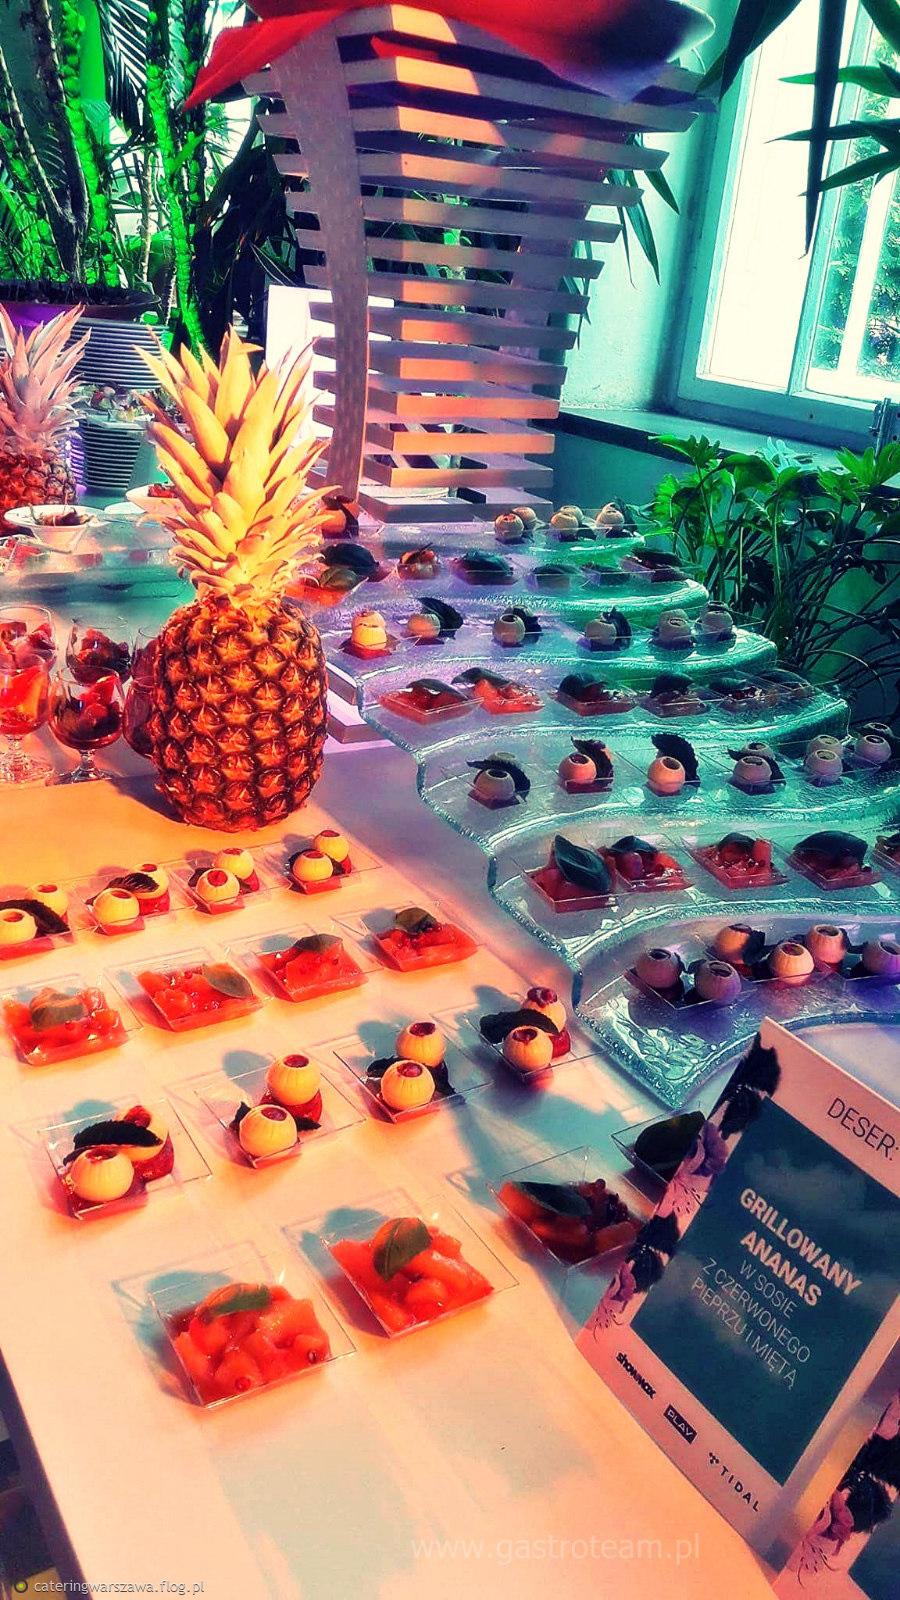 Tag Kuchnia Hawajska Archiwum Fotobloga Cateringwarszawa Flog Pl